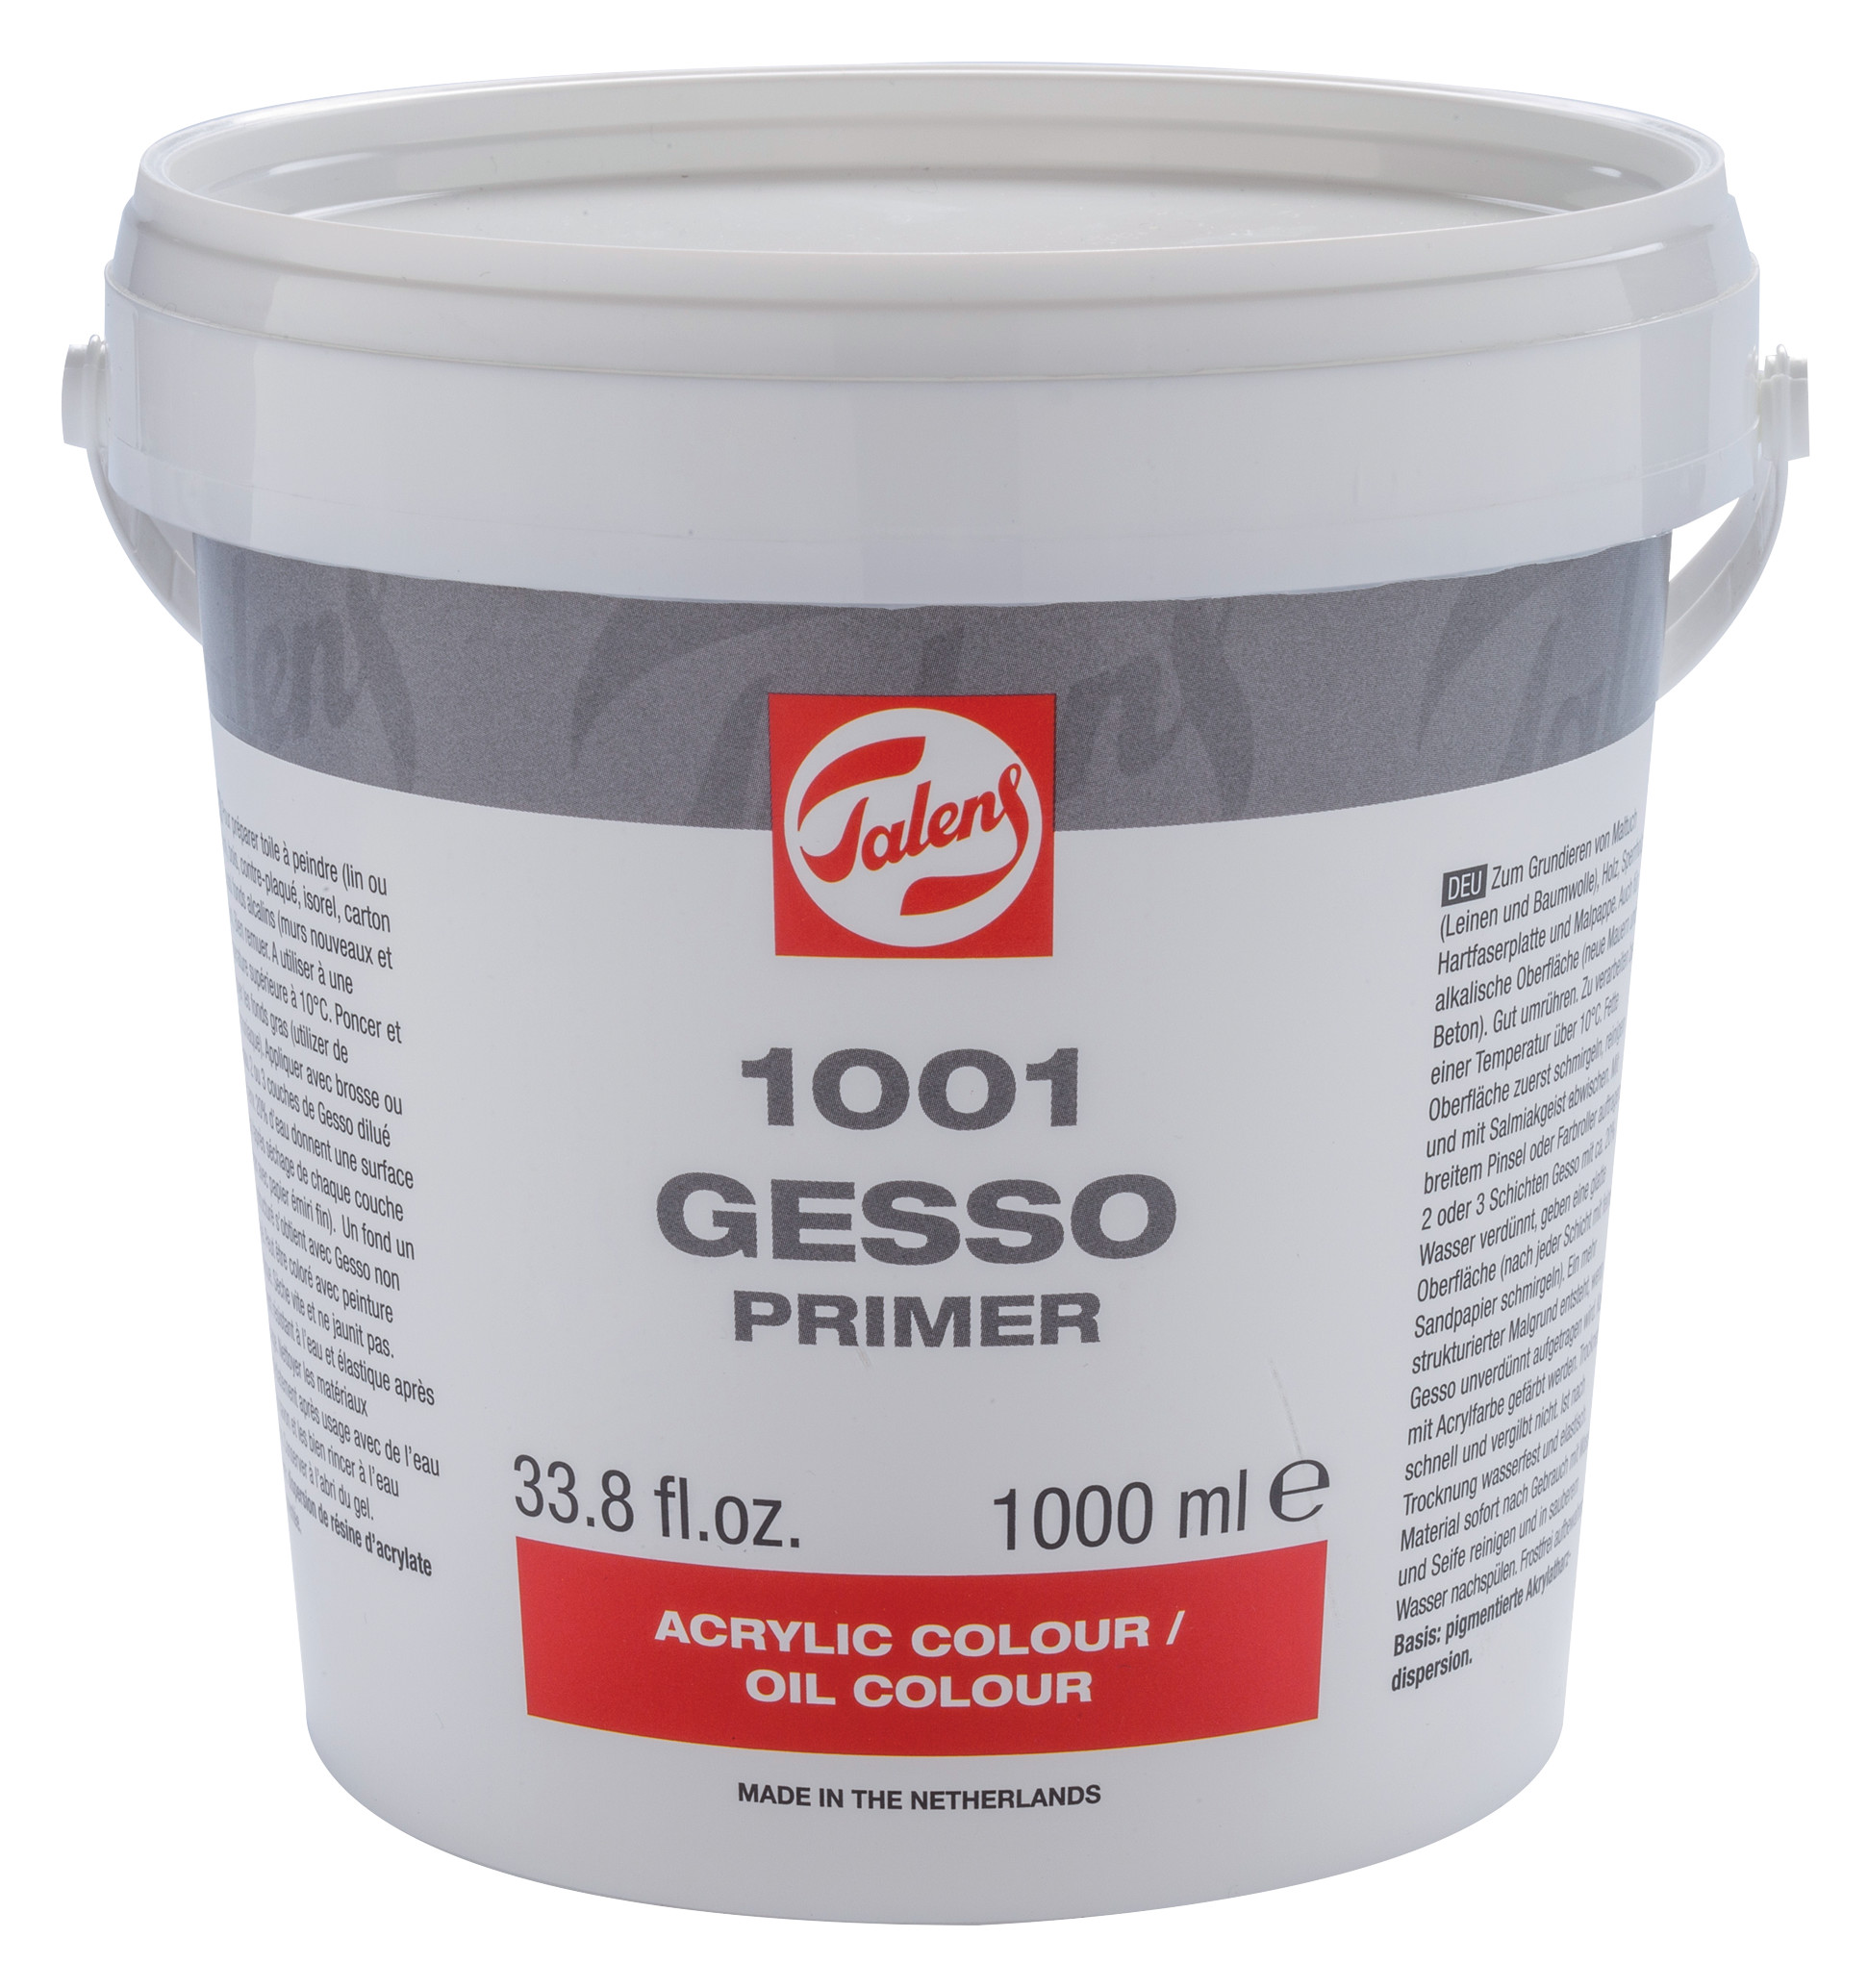 Gesso Primer Bucket 1000 ml